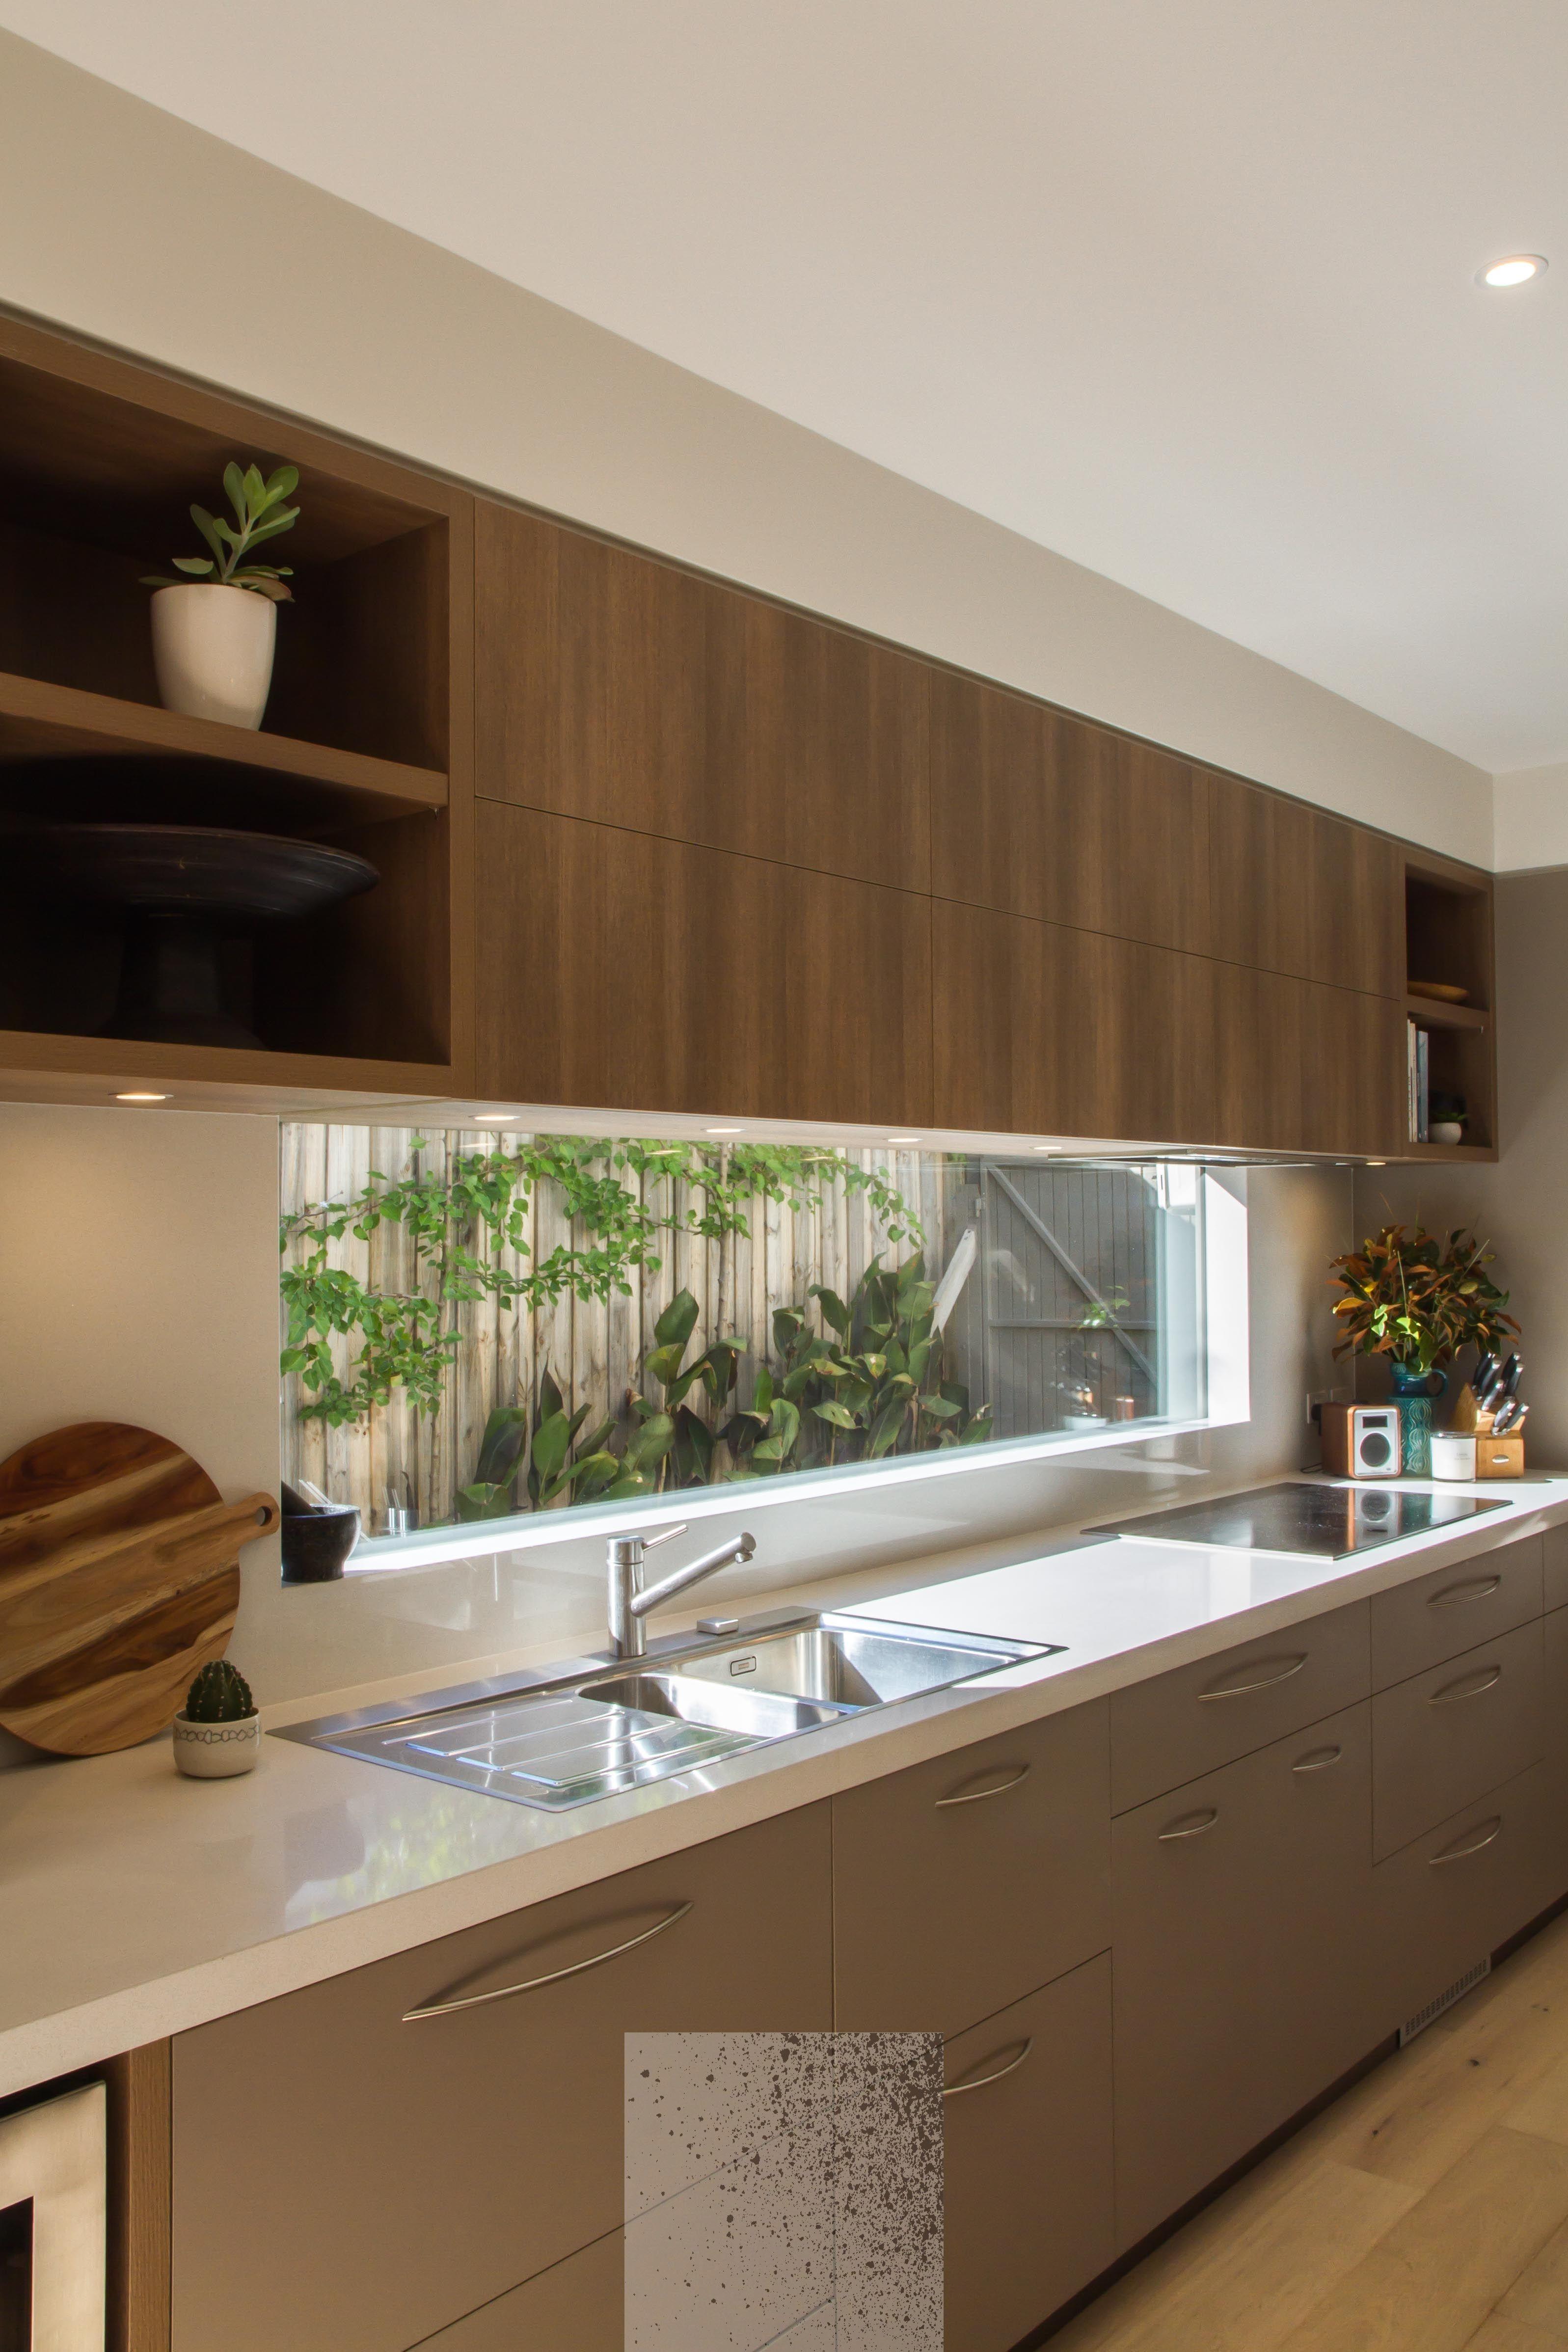 15+ Rapturous Contemporary Bathroom Wood Ideas in 2020